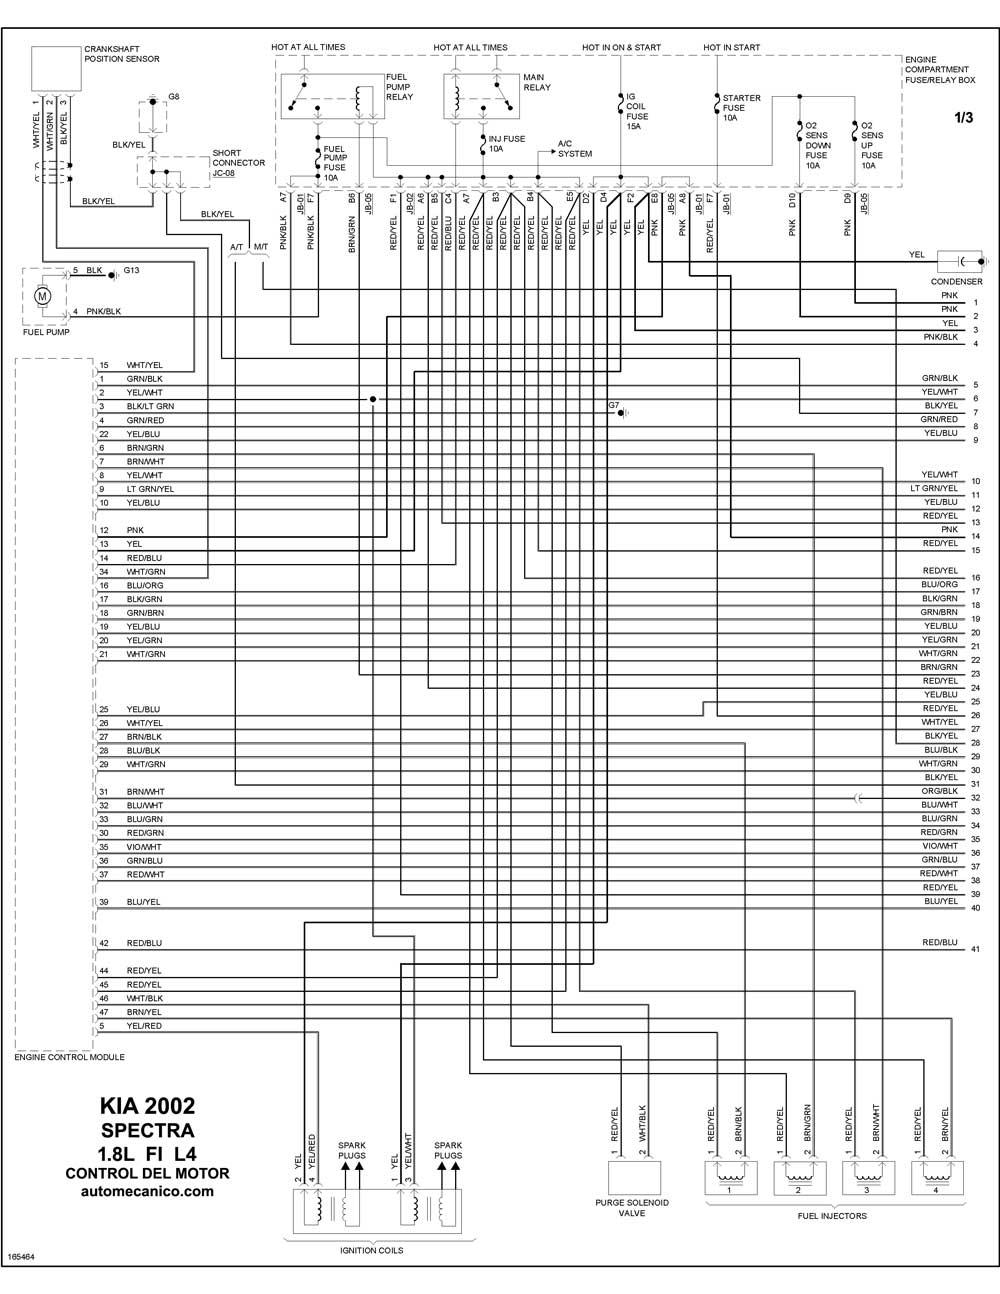 2008 kia rio Diagrama del motor